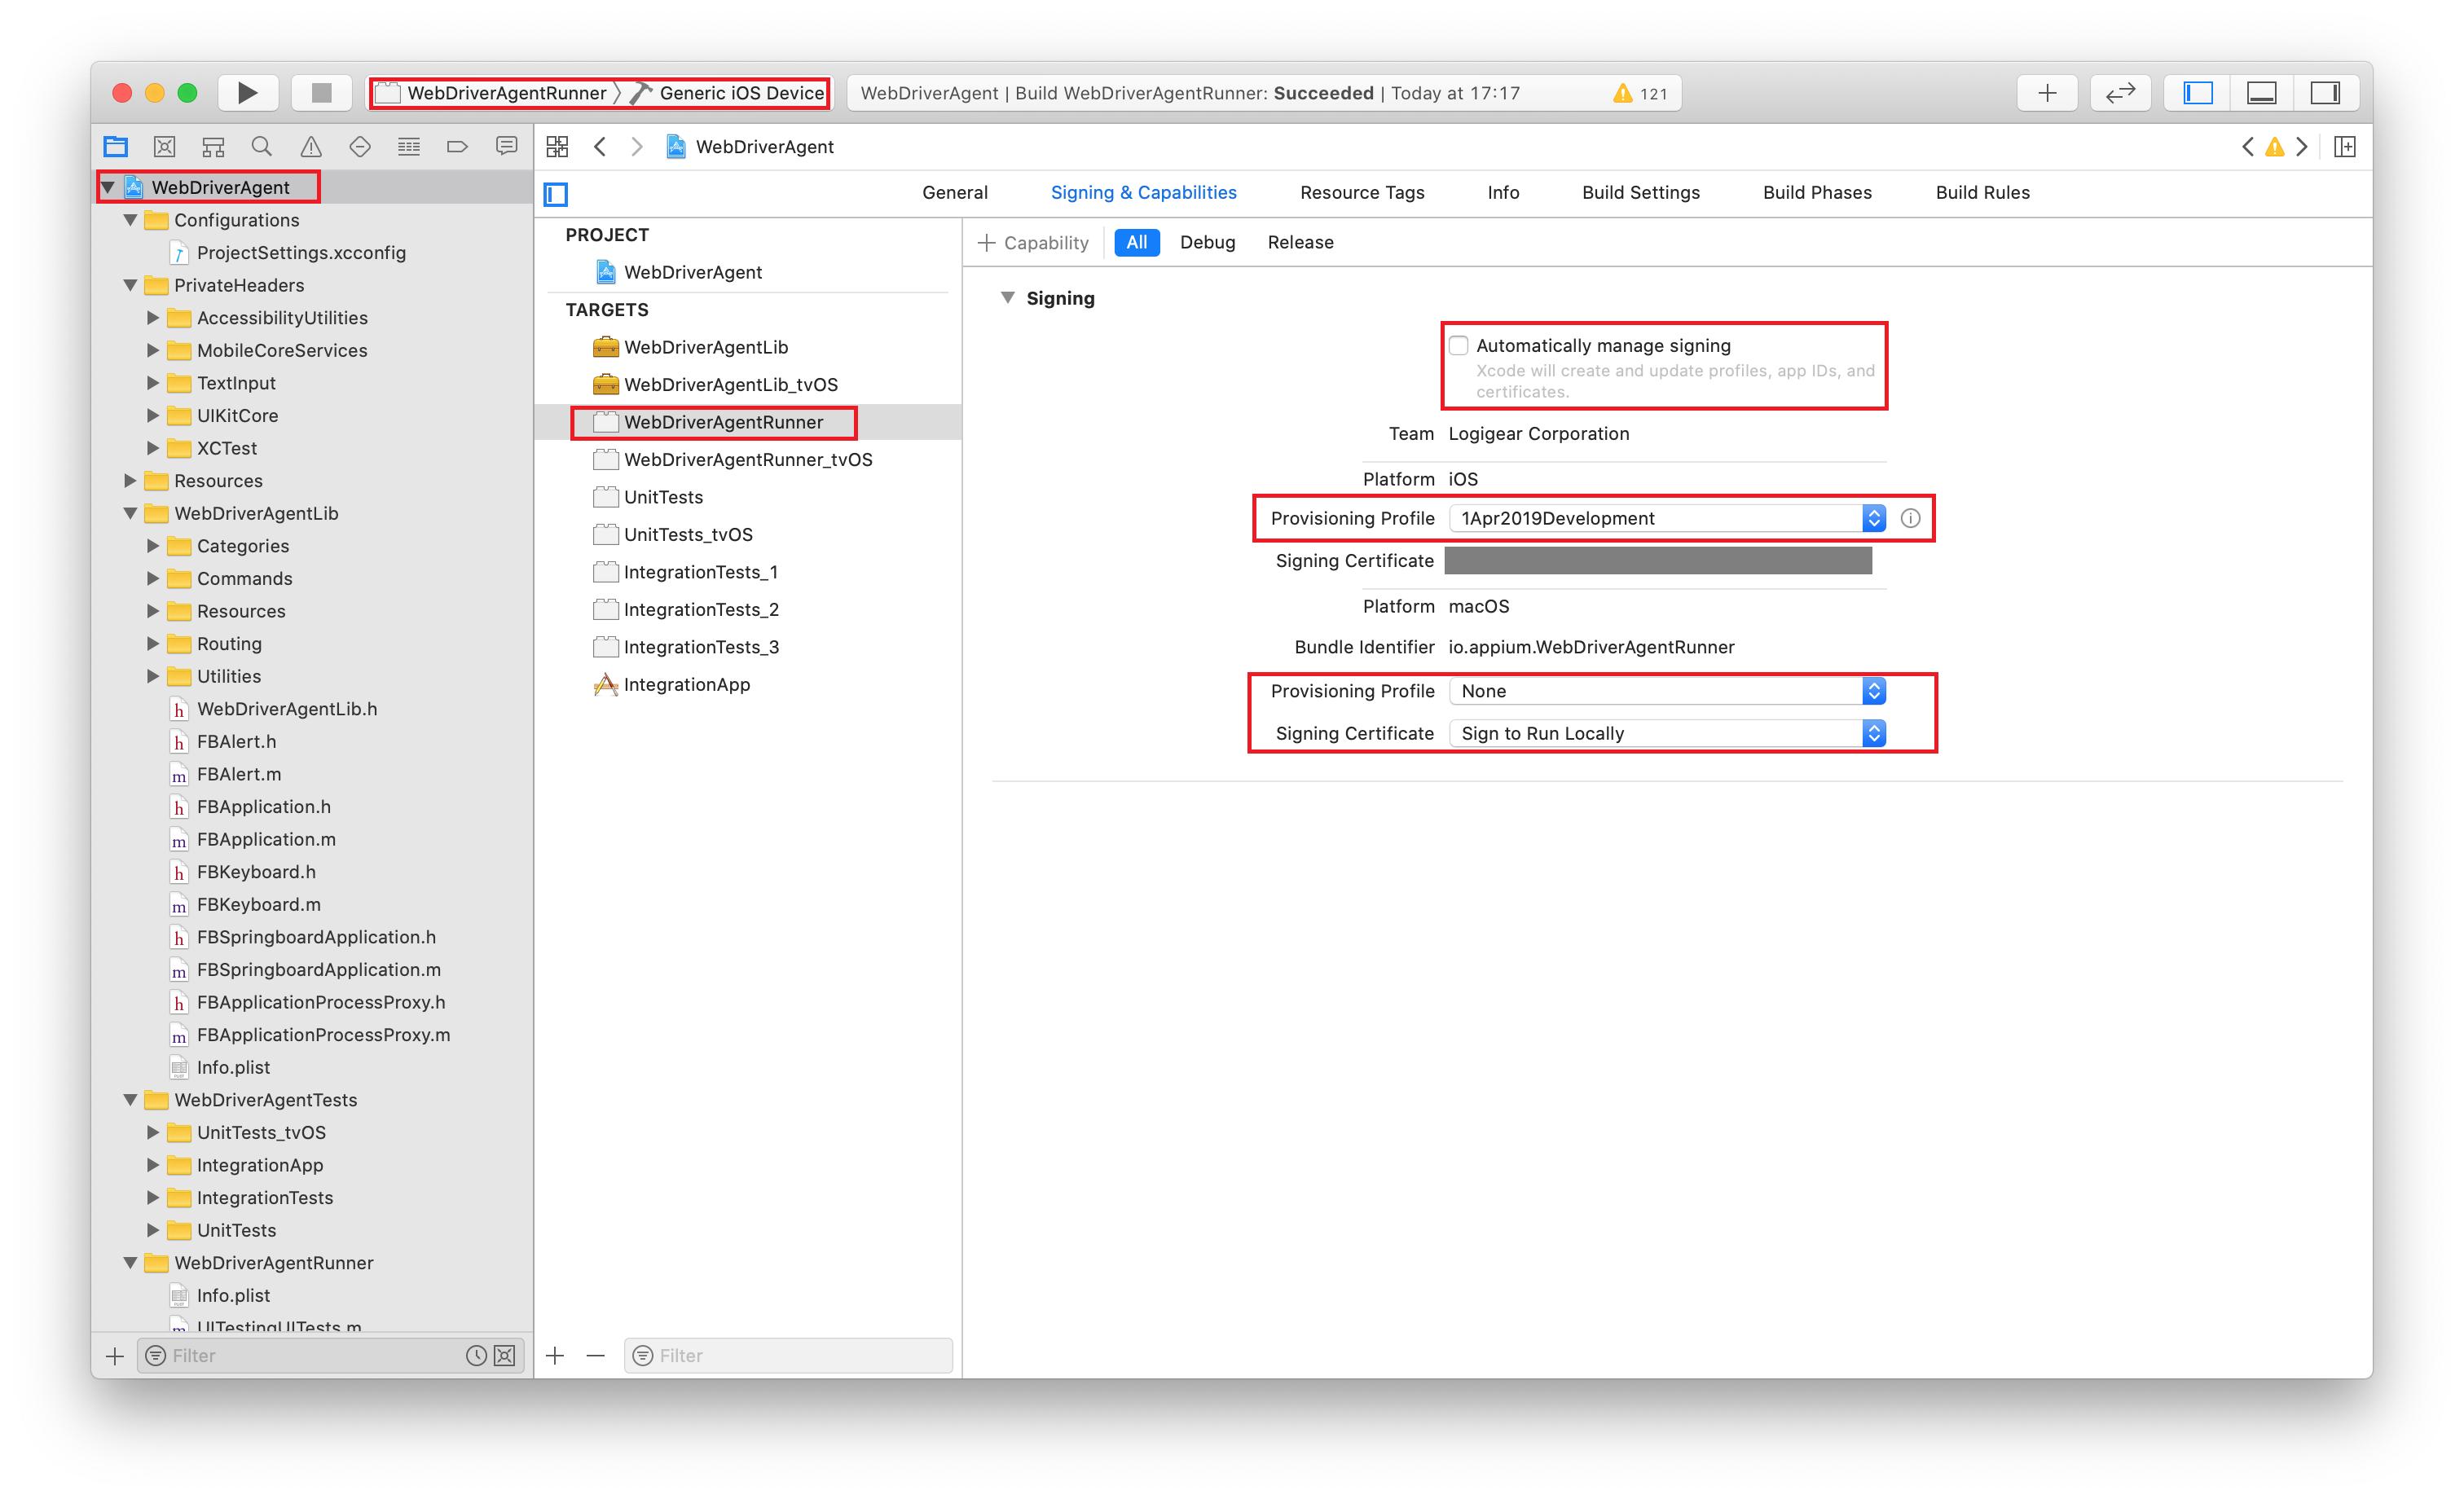 build-webdriveragent